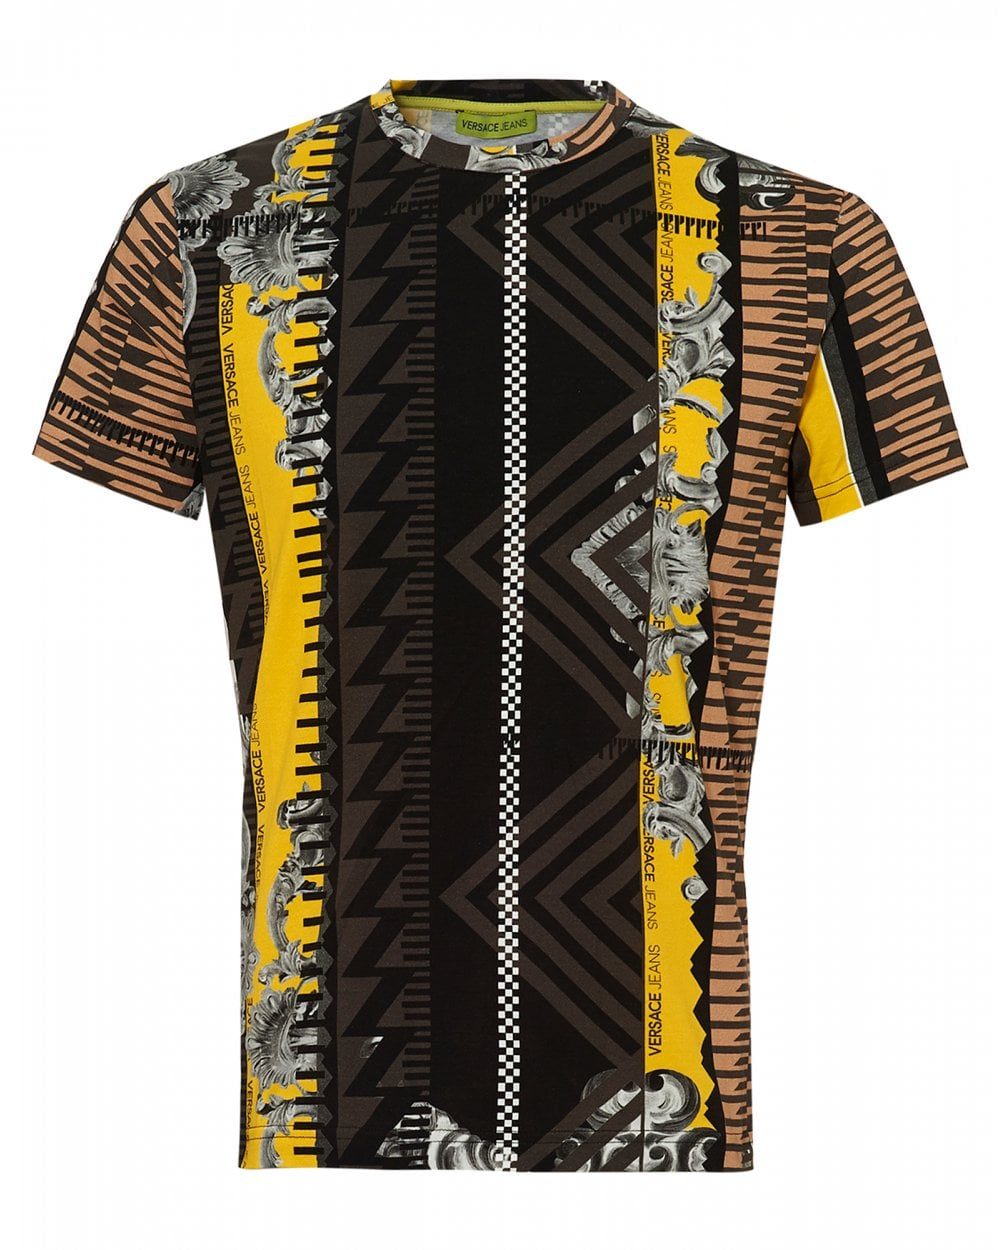 92987f5c5b7 Versace Jeans Mens Baroque Print T-Shirt